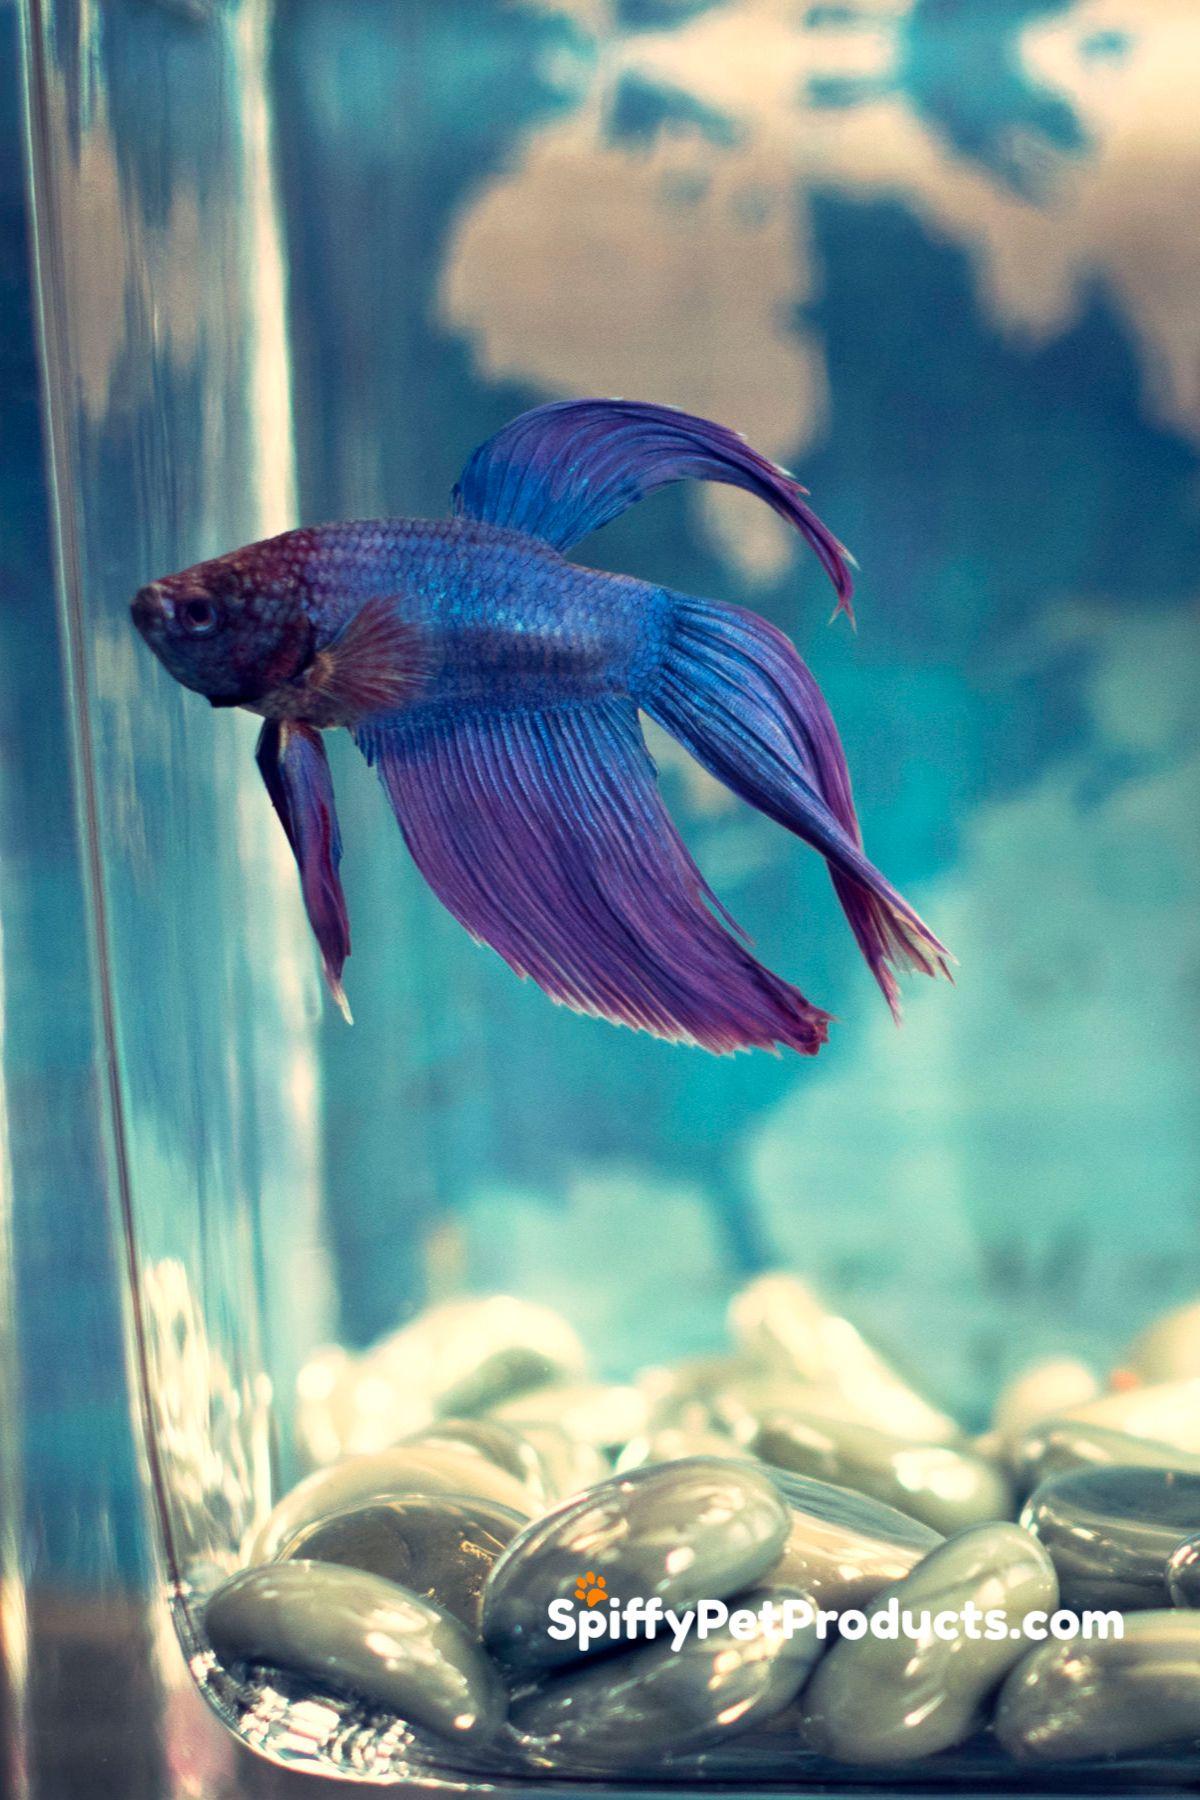 Betta Fish Tank Setup Ideas That Make A Statement Spiffy Pet Products Betta Fish Tank Pet Fish Betta Fish